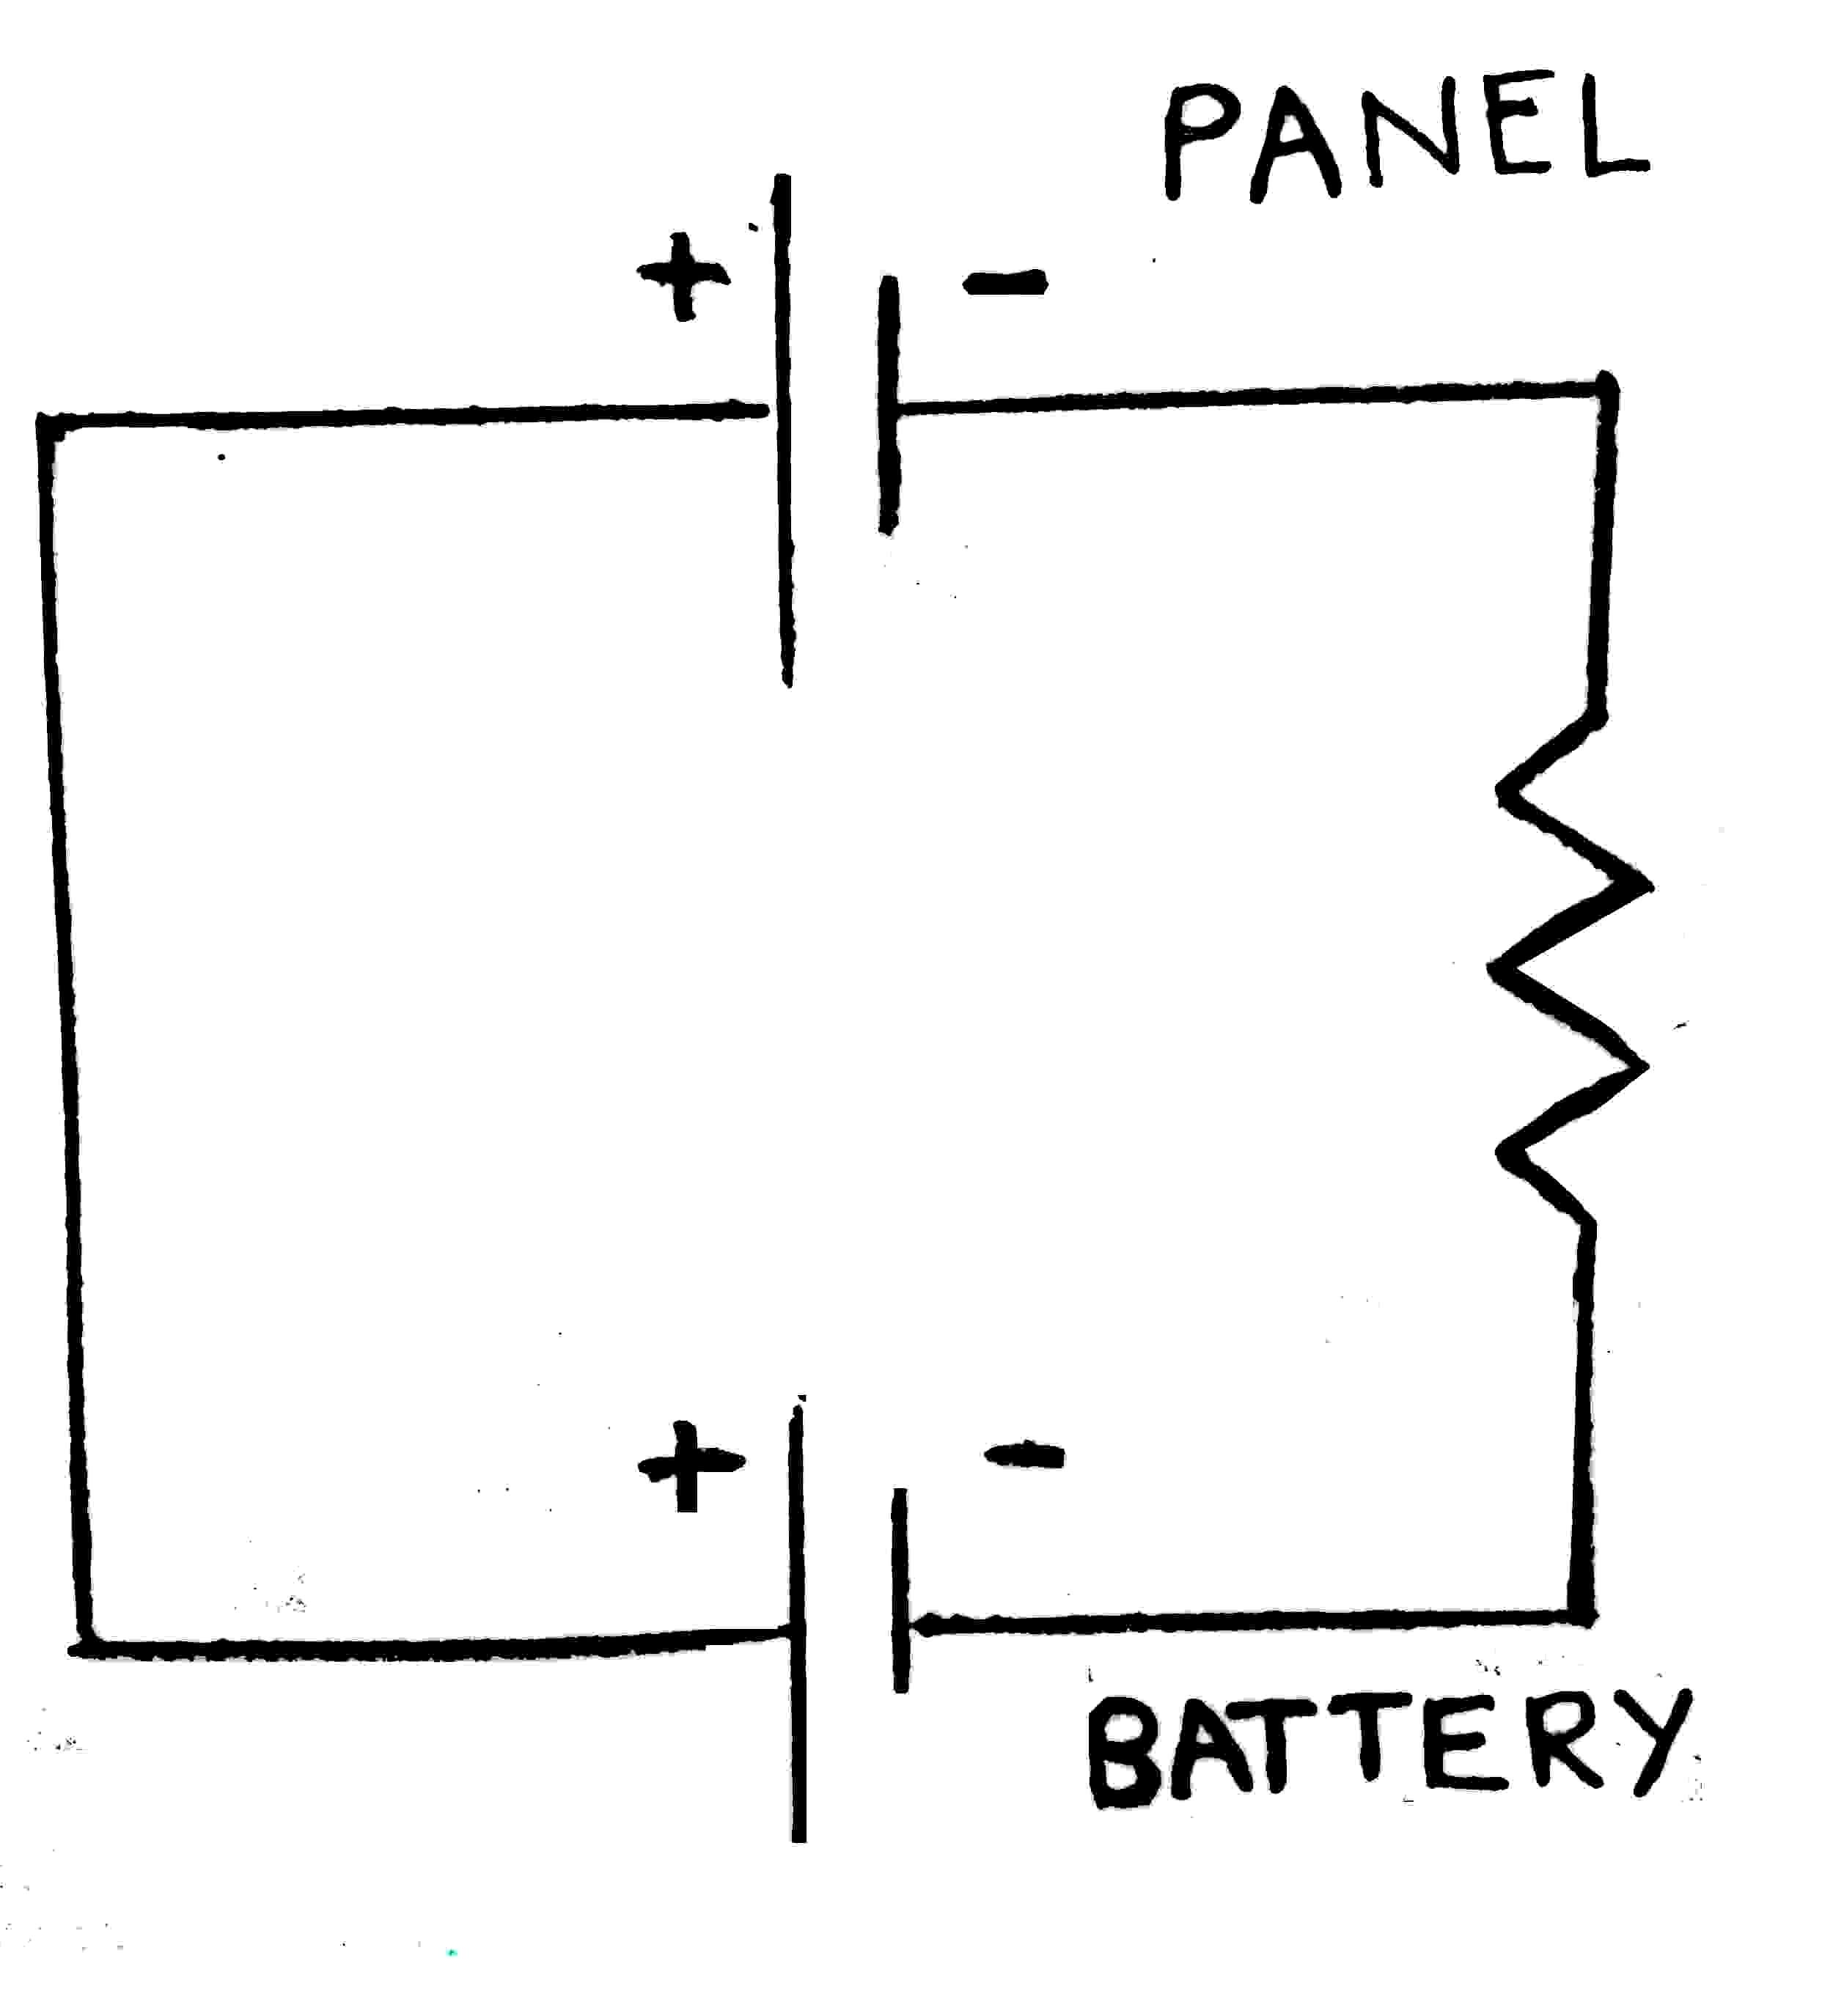 ponent Series Circuit Diagrams For The Od Lessonssolar06lampcircuitdesign2 Draft Pen Wiki Solving Parallel Lamp Simple Ci